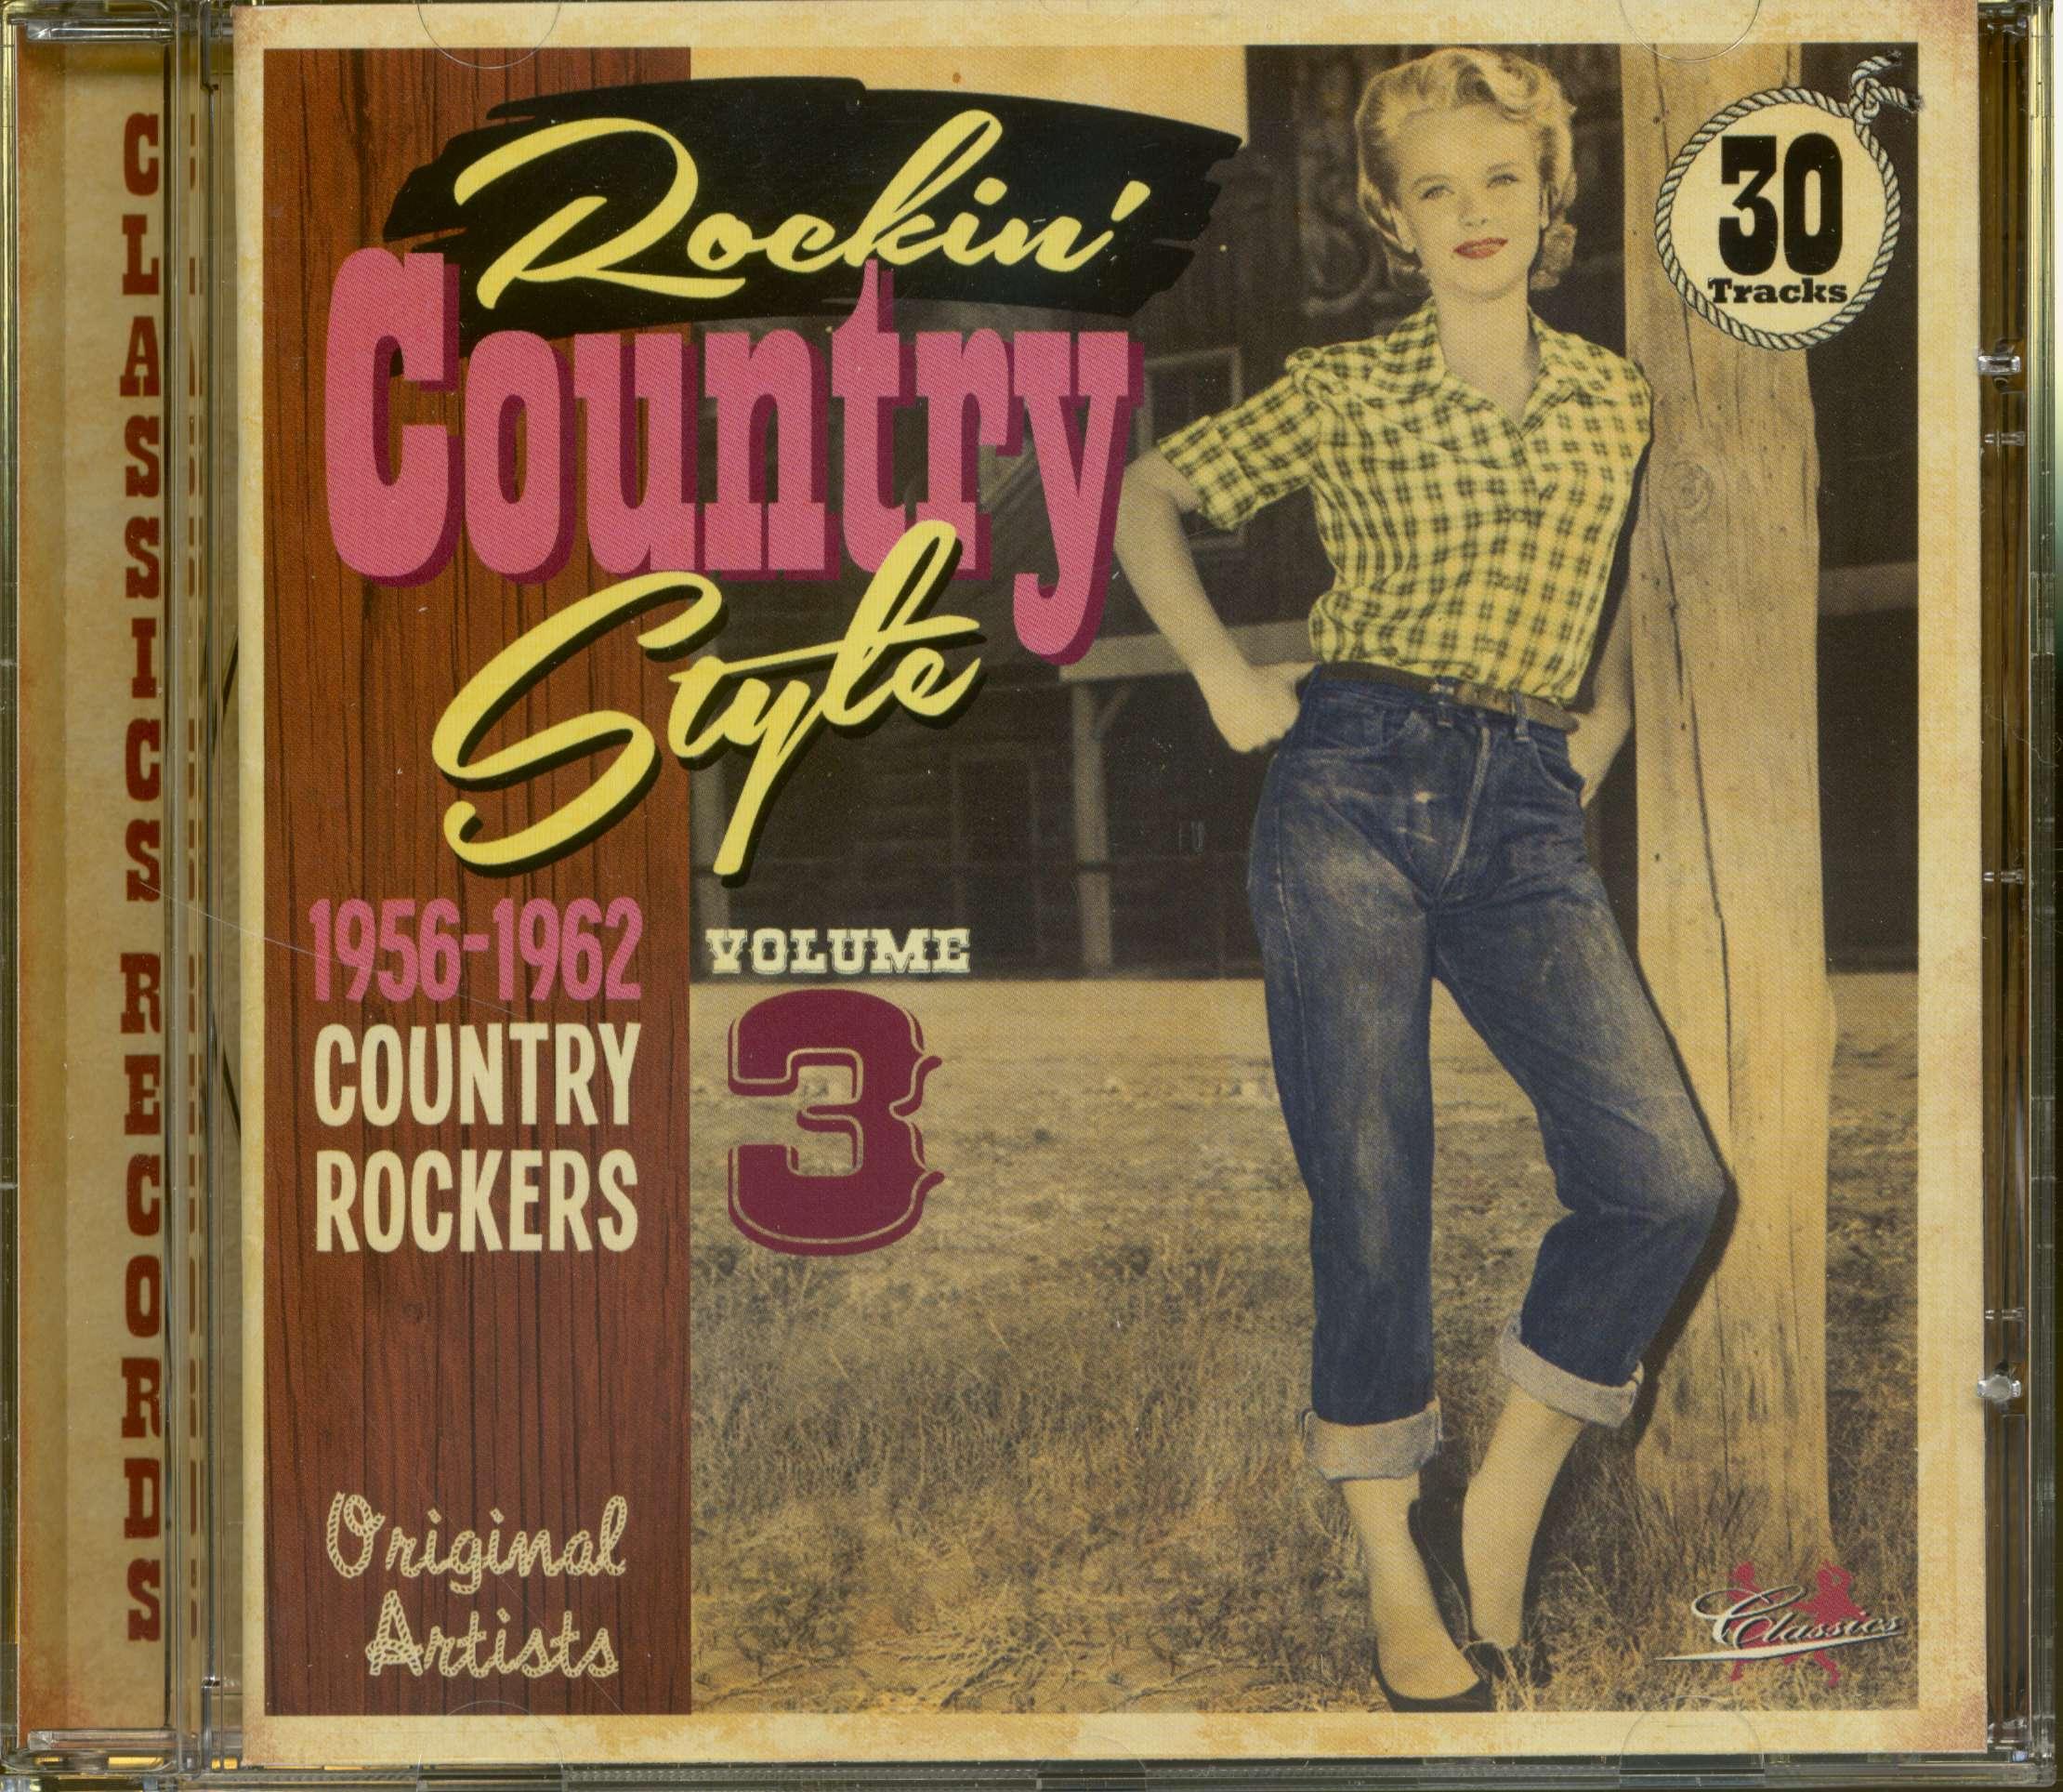 Swinging hollywood hillbilly cowboys vol 3 nice